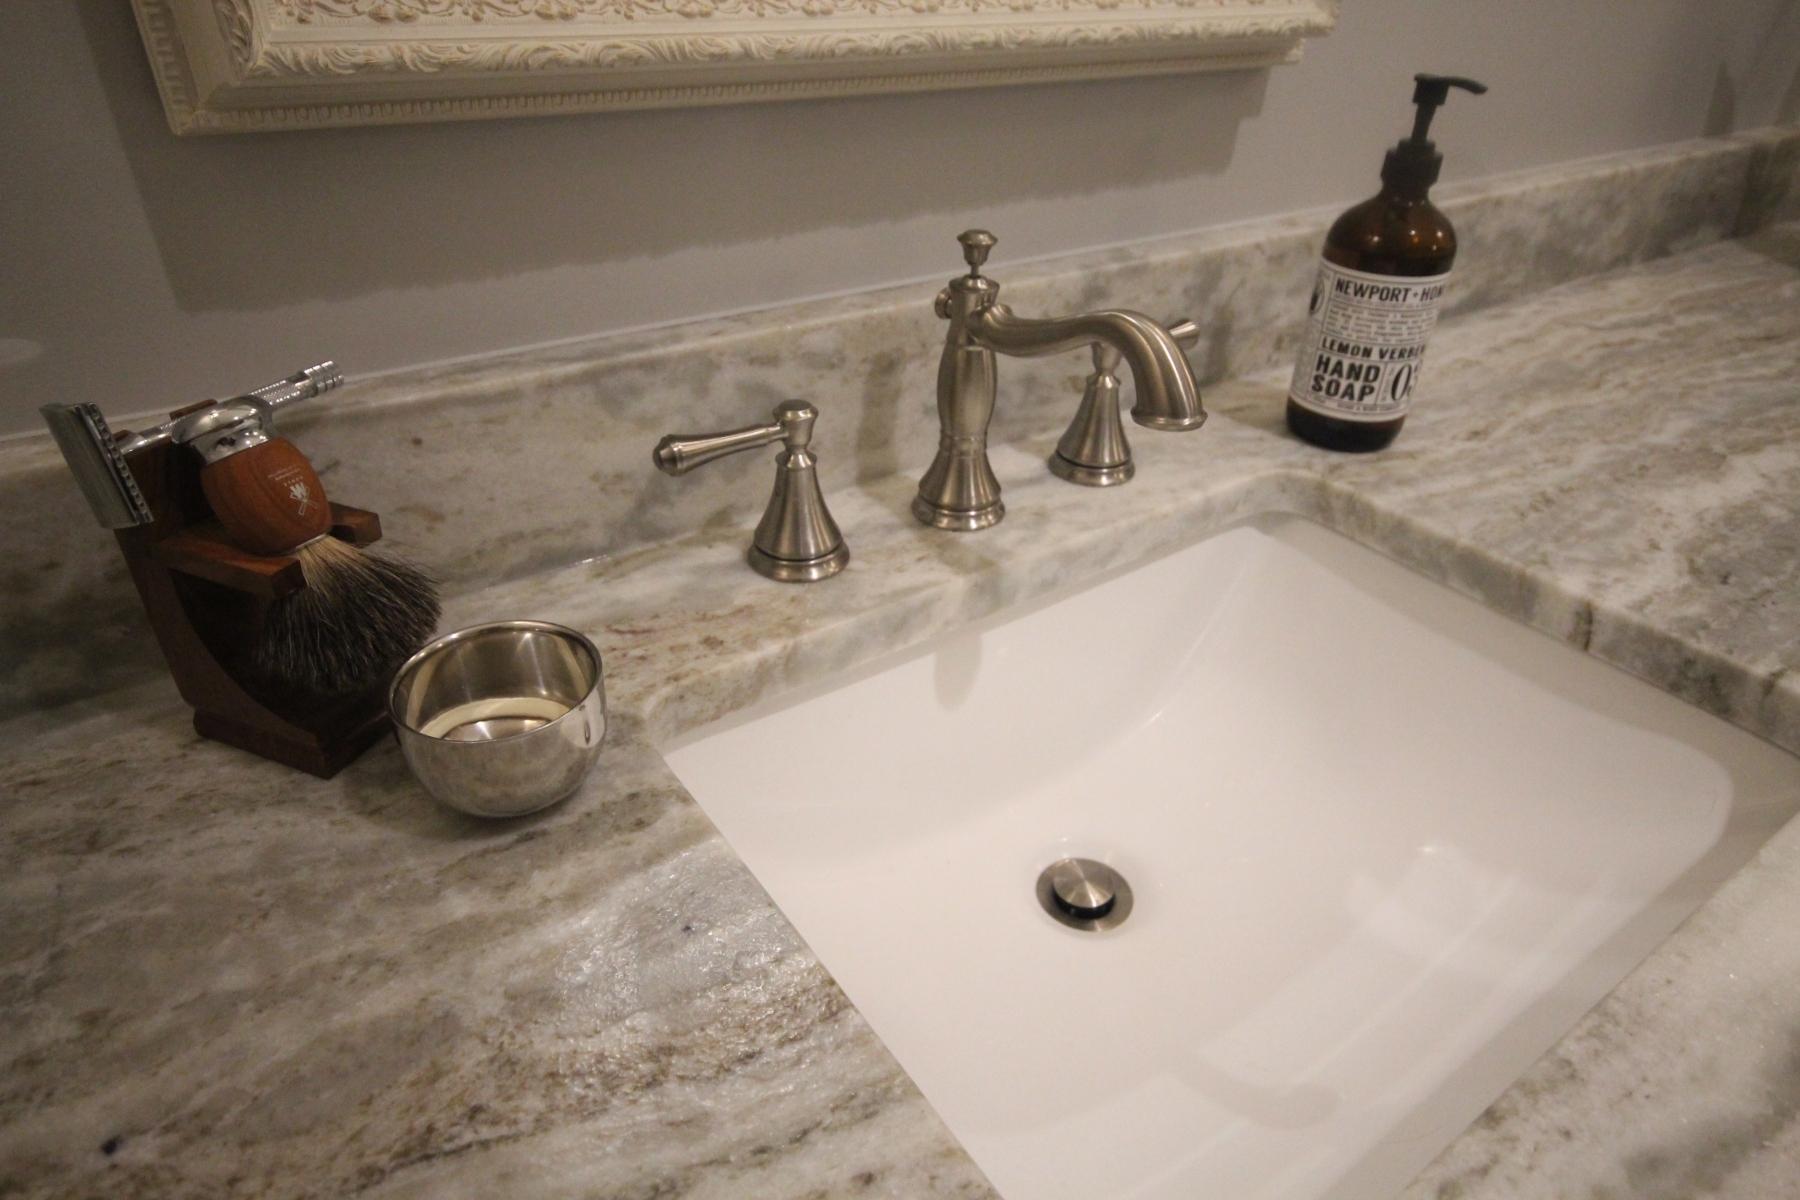 10-bh-bathroom-remodel-8